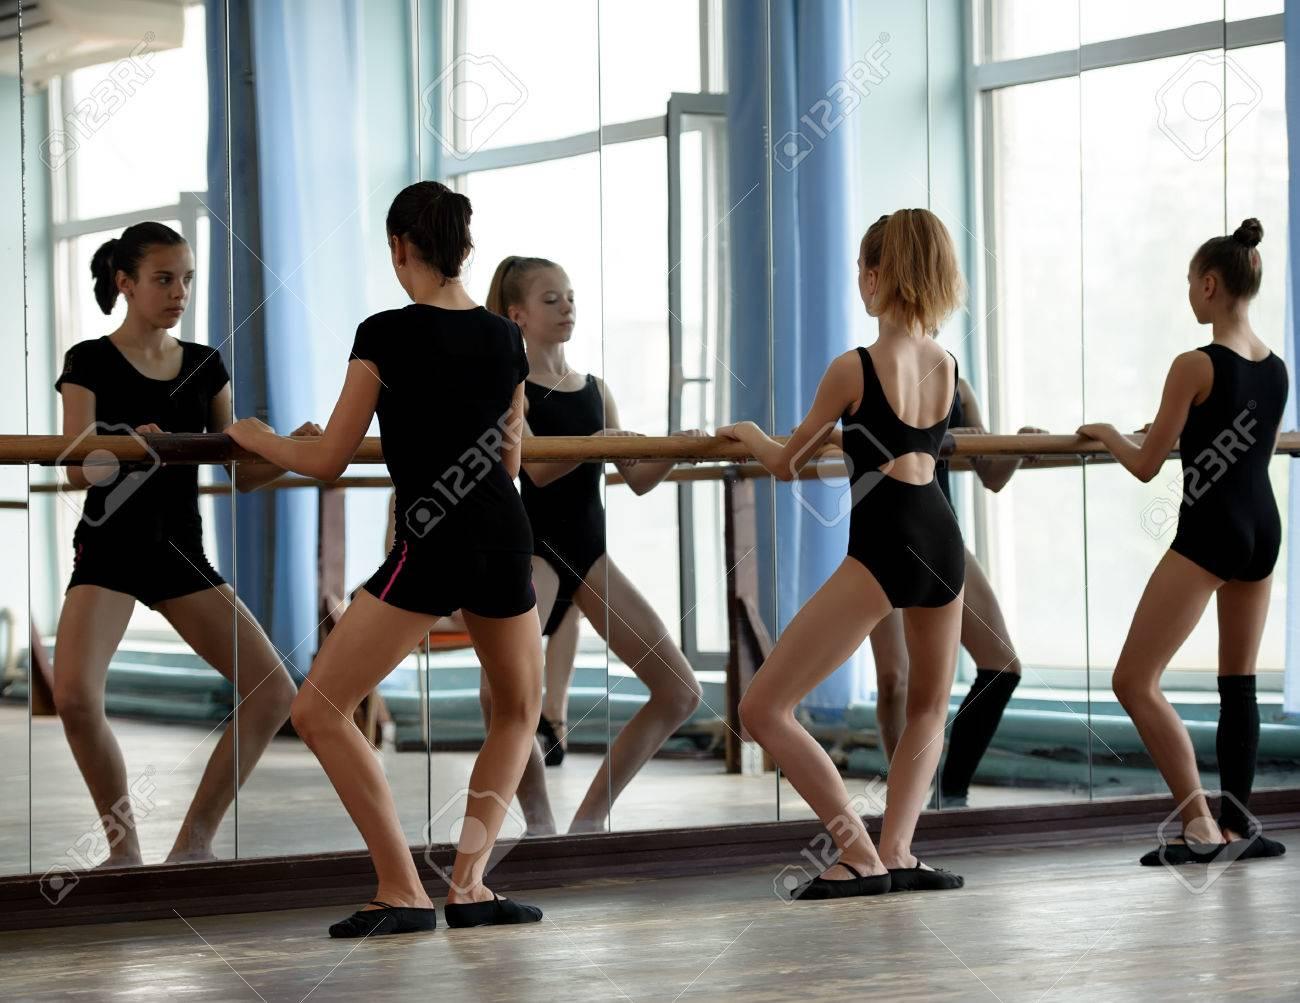 Фото репетиции балерины 4 фотография